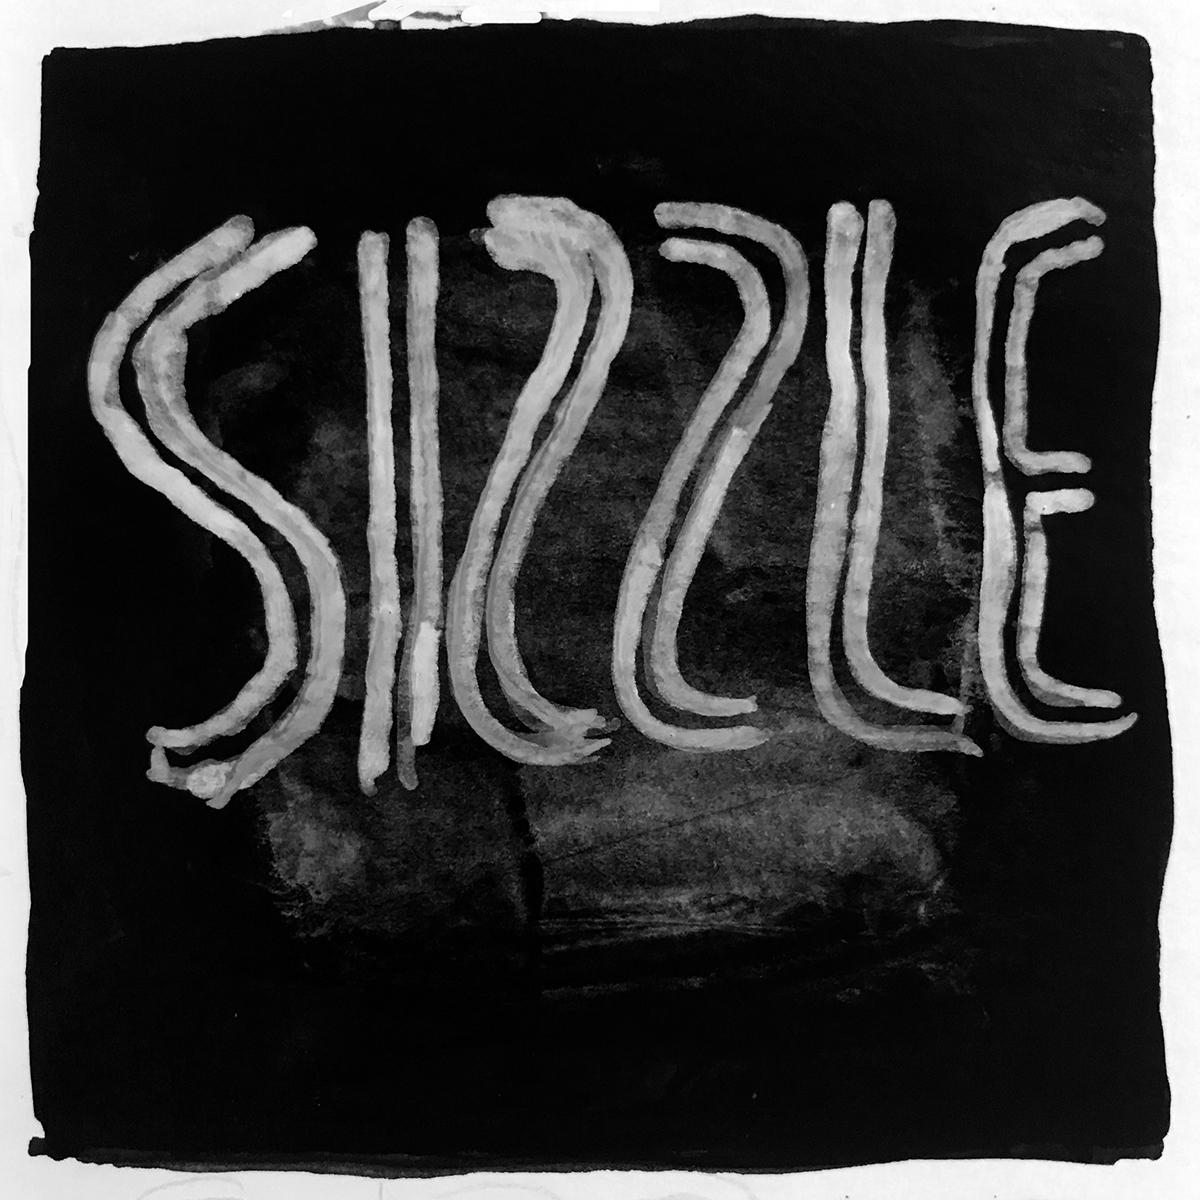 Sam Rivers Sizzle